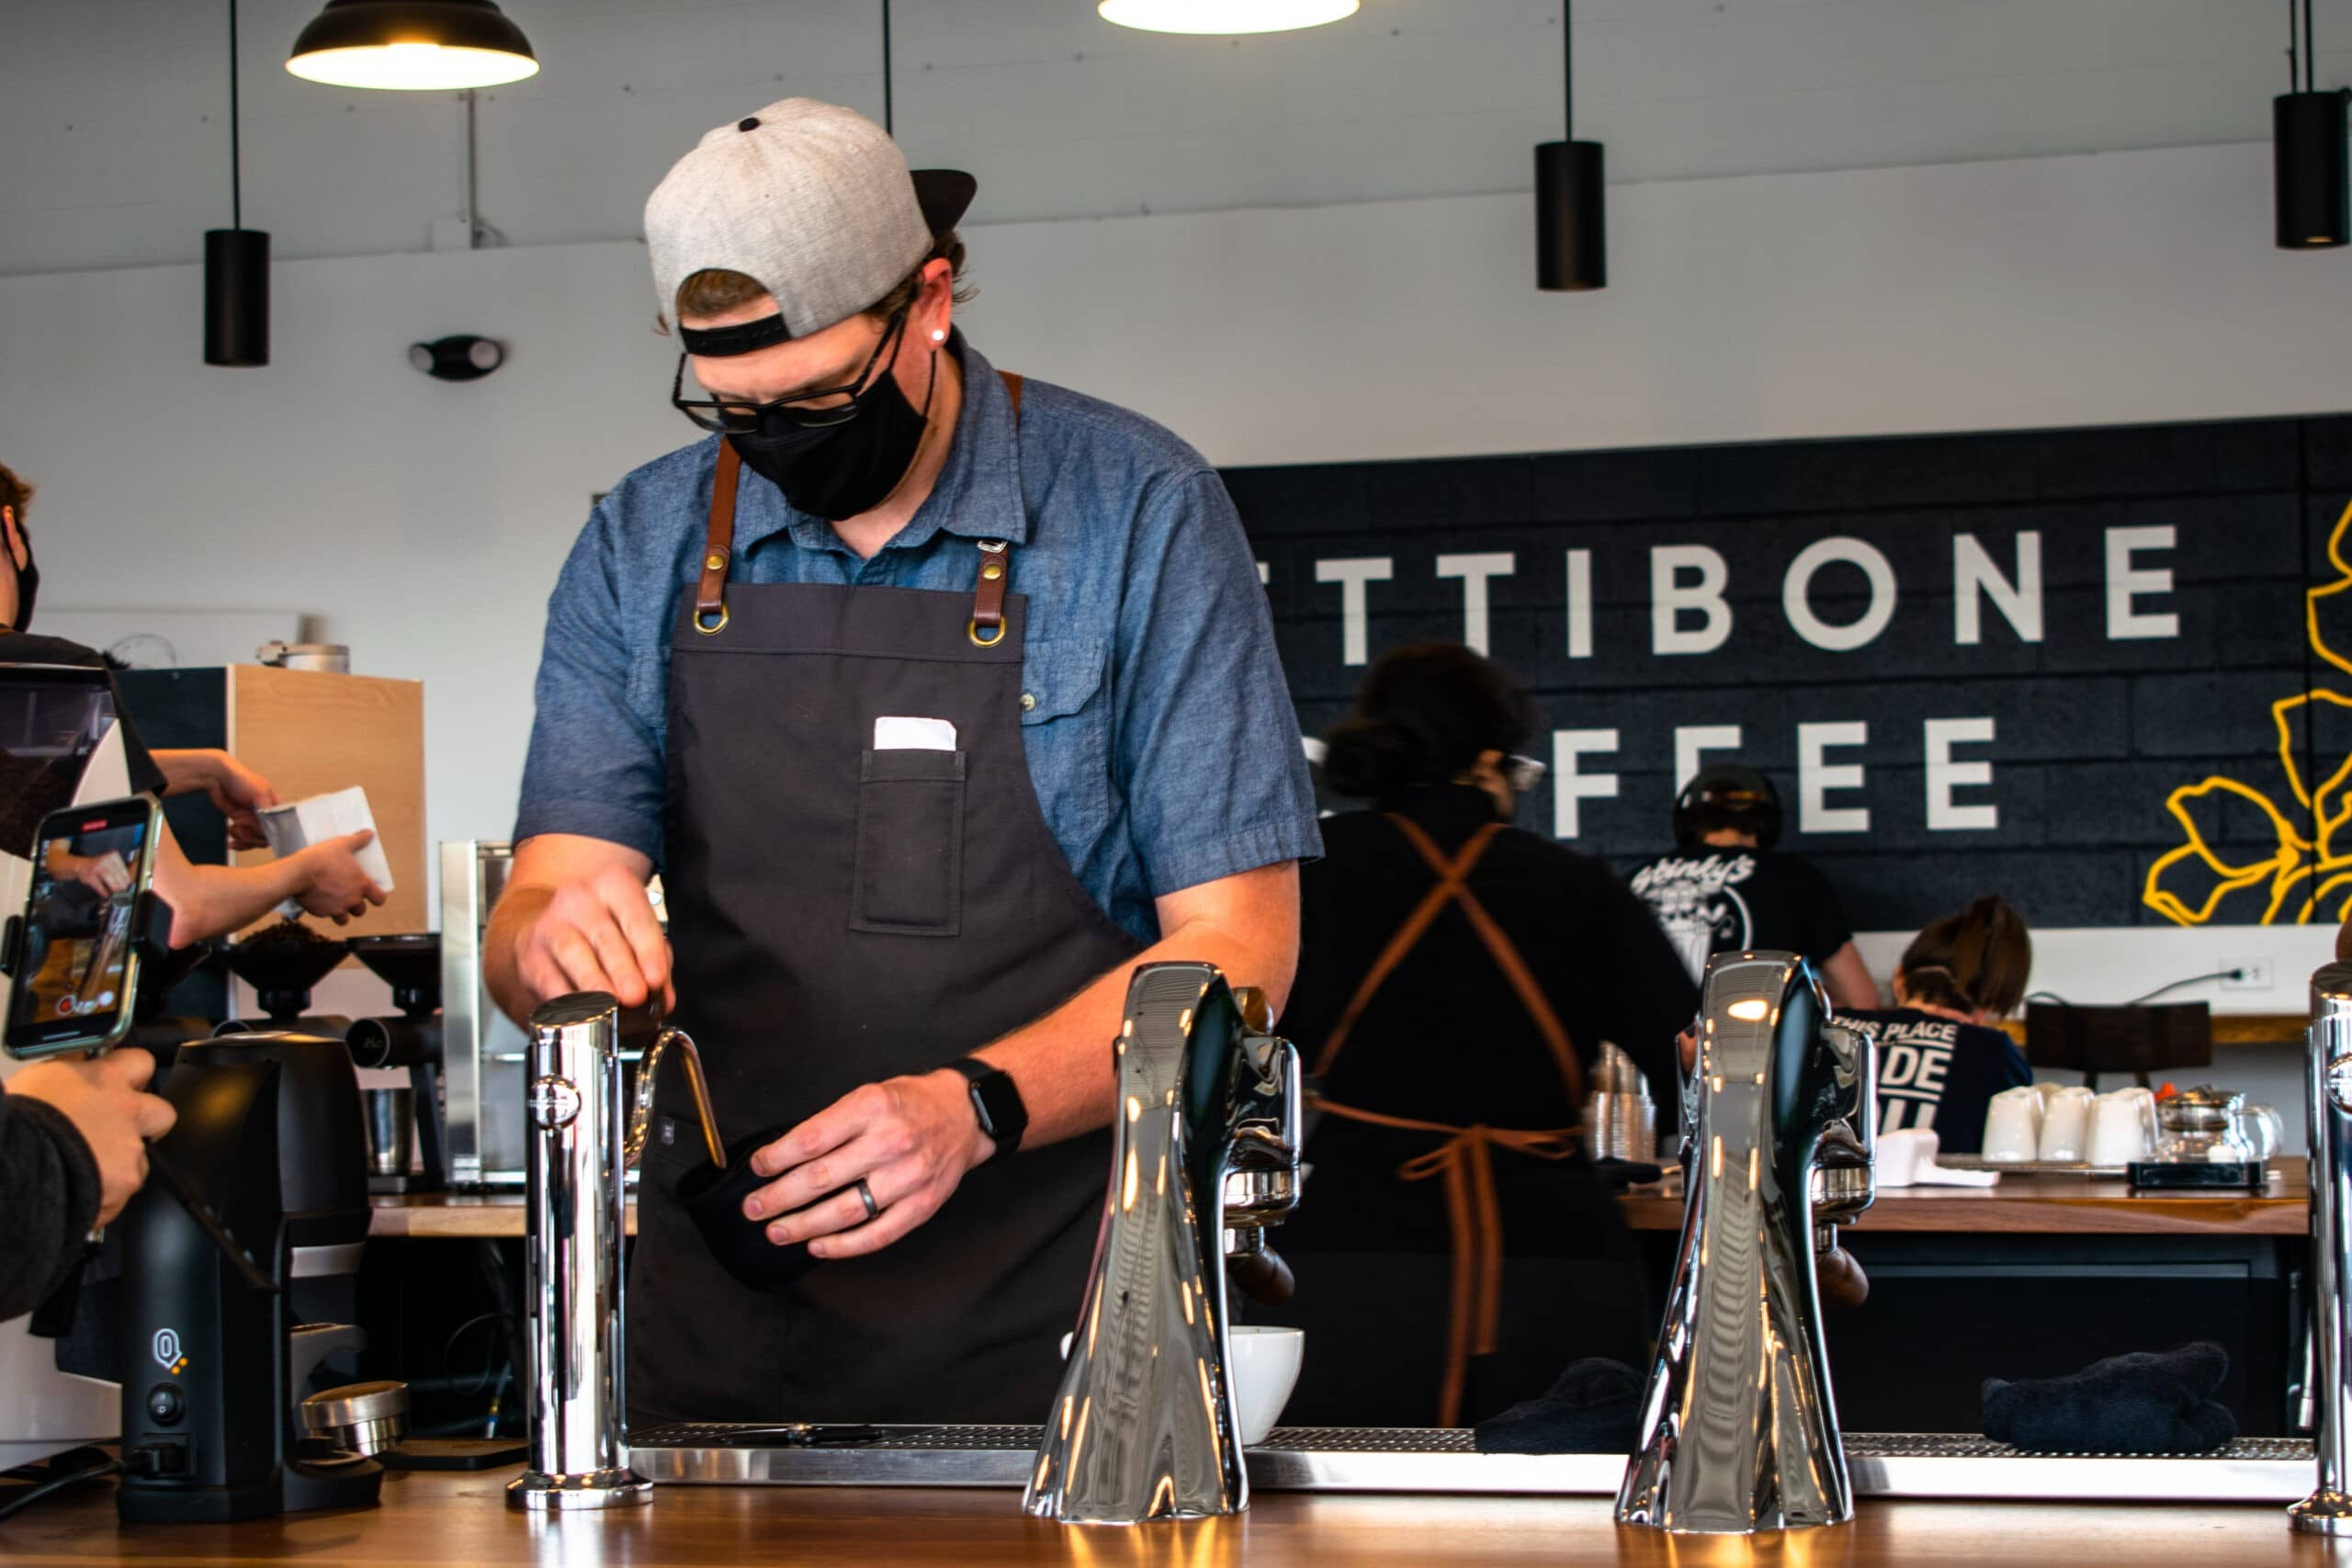 Barista at Pettibone Coffee preparing a latte.